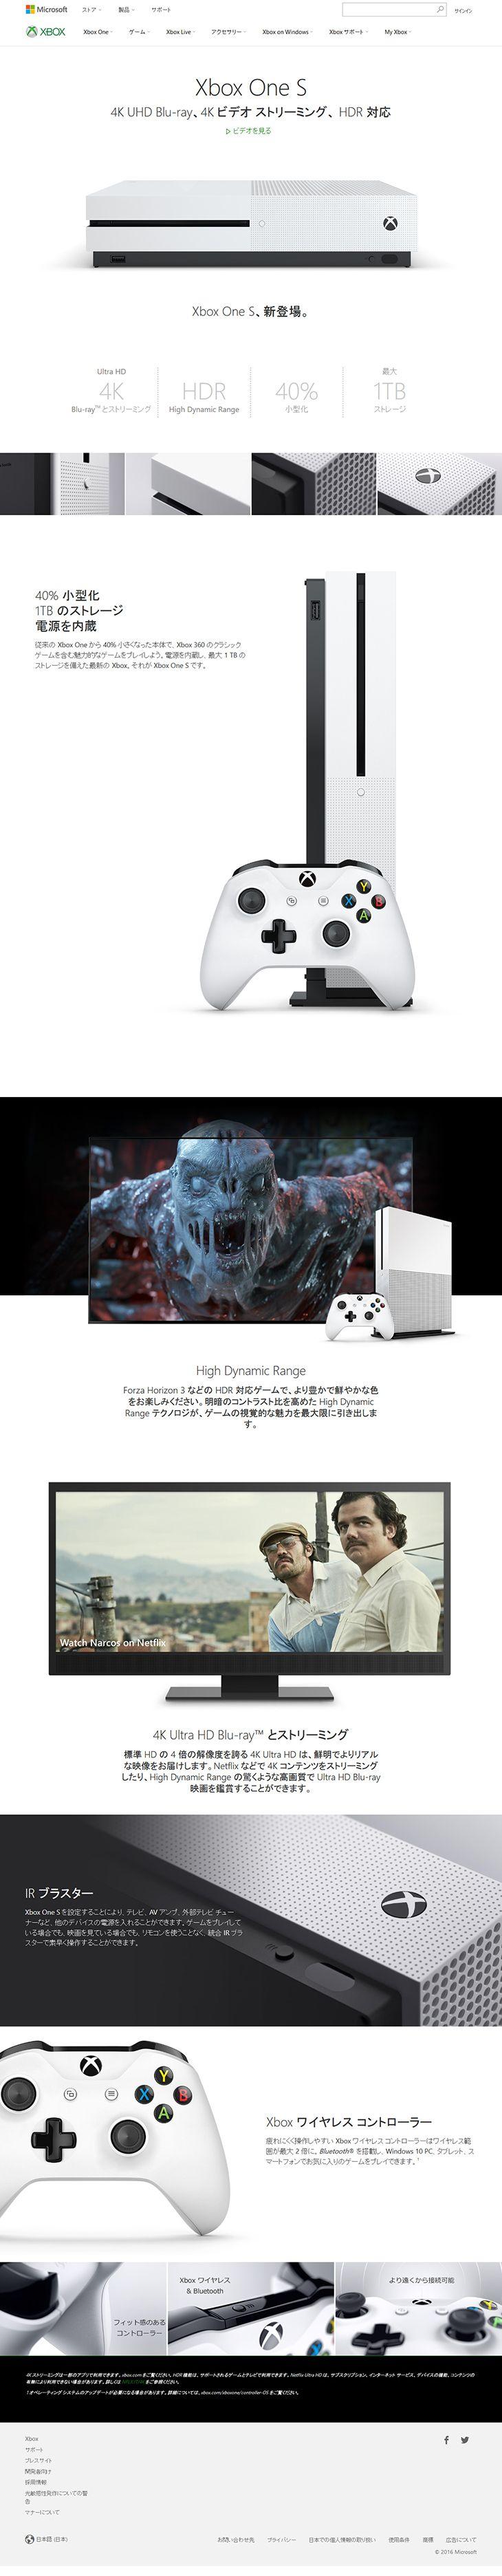 Xbox One S【キッズ・ベビー・玩具関連】のLPデザイン。WEBデザイナーさん必見!ランディングページのデザイン参考に(シンプル系)